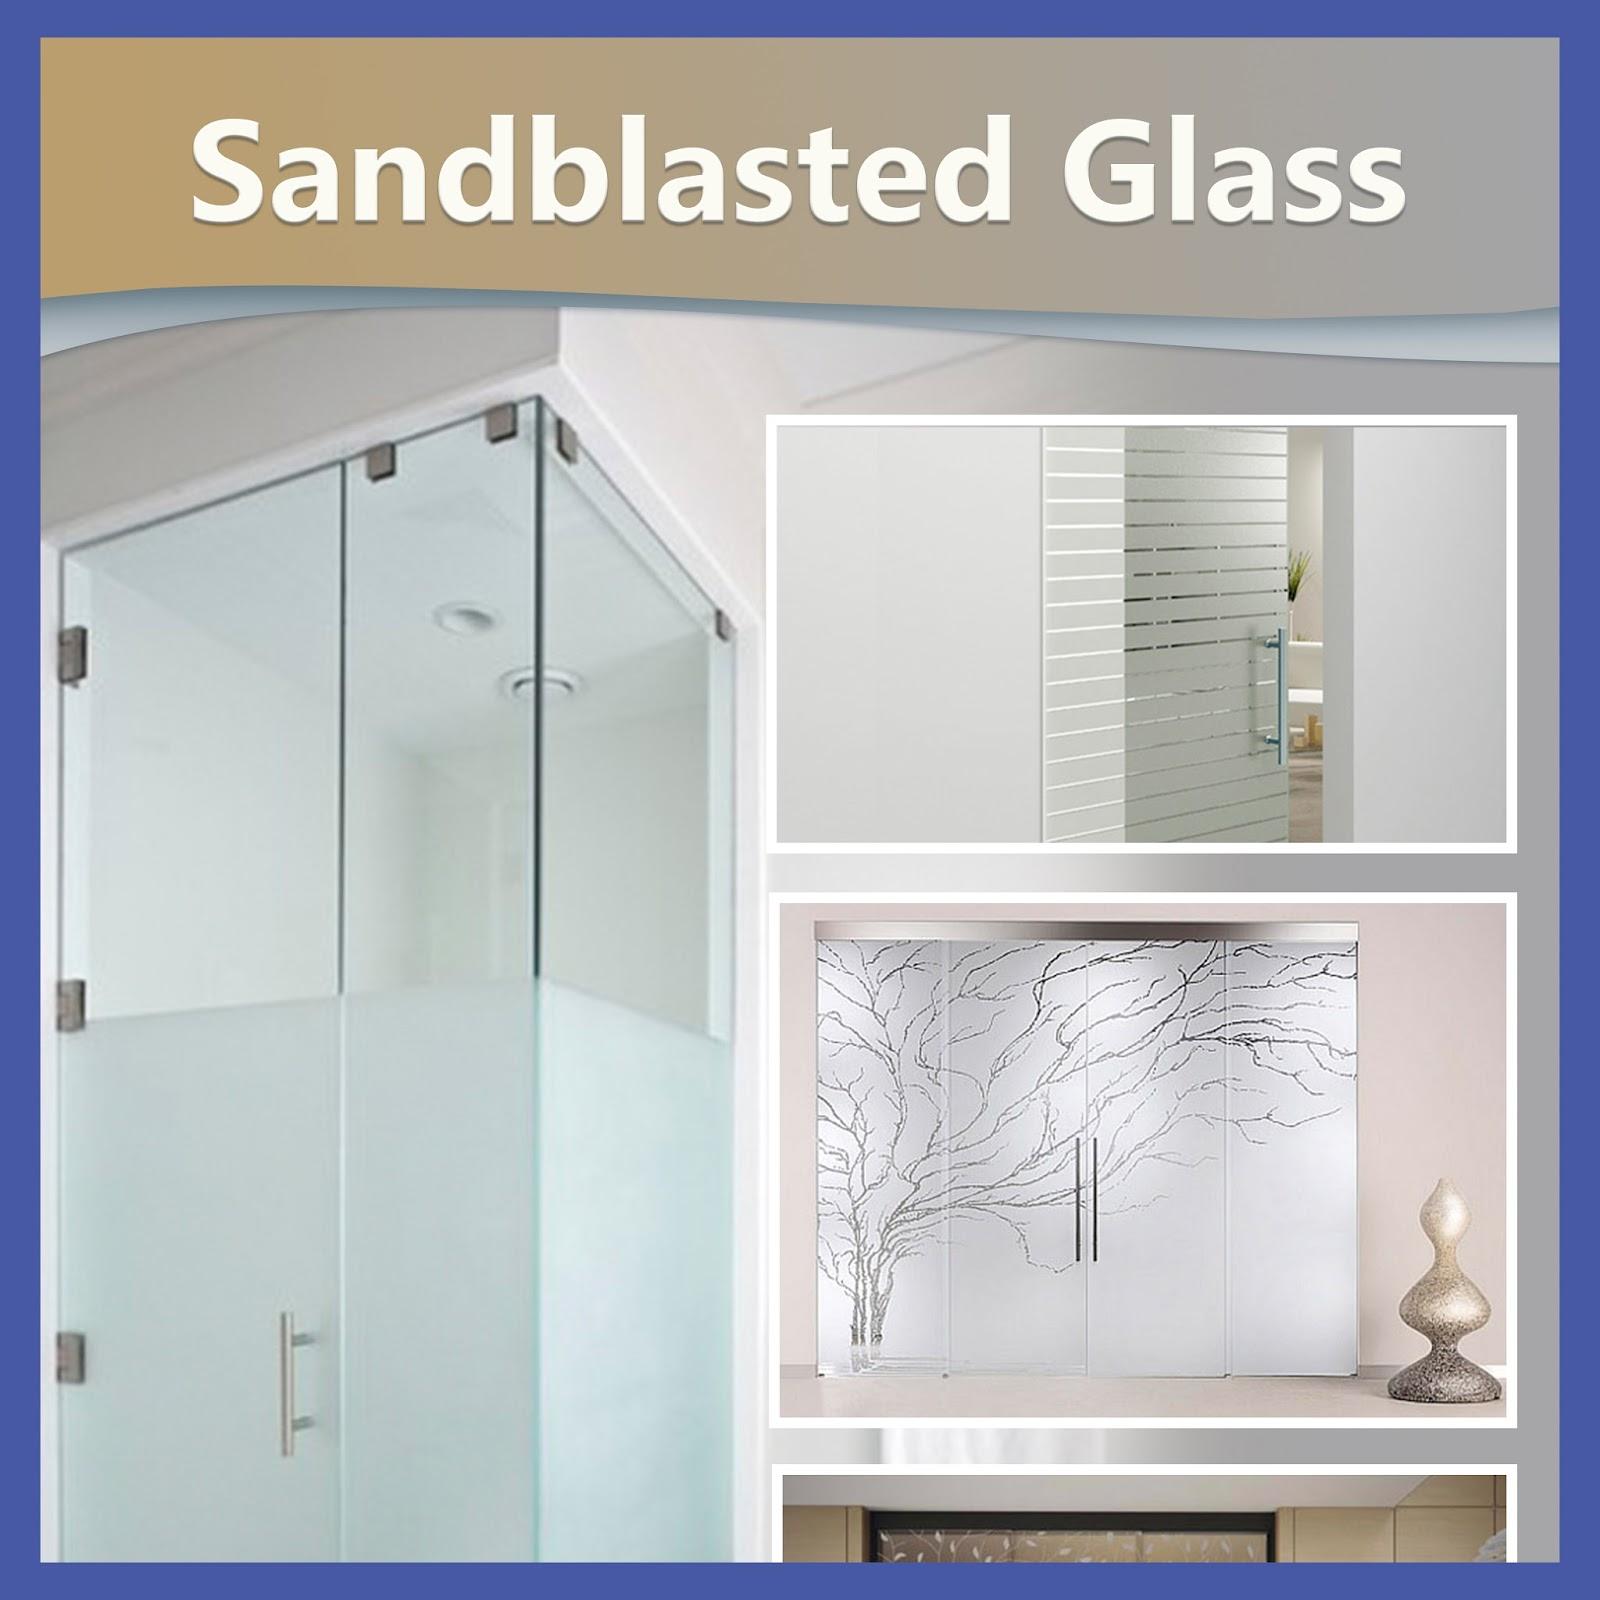 sc 1 st  Shower Door Installation nyc & Sandblasted Glass | showerdoorinstallationnyc.com pezcame.com